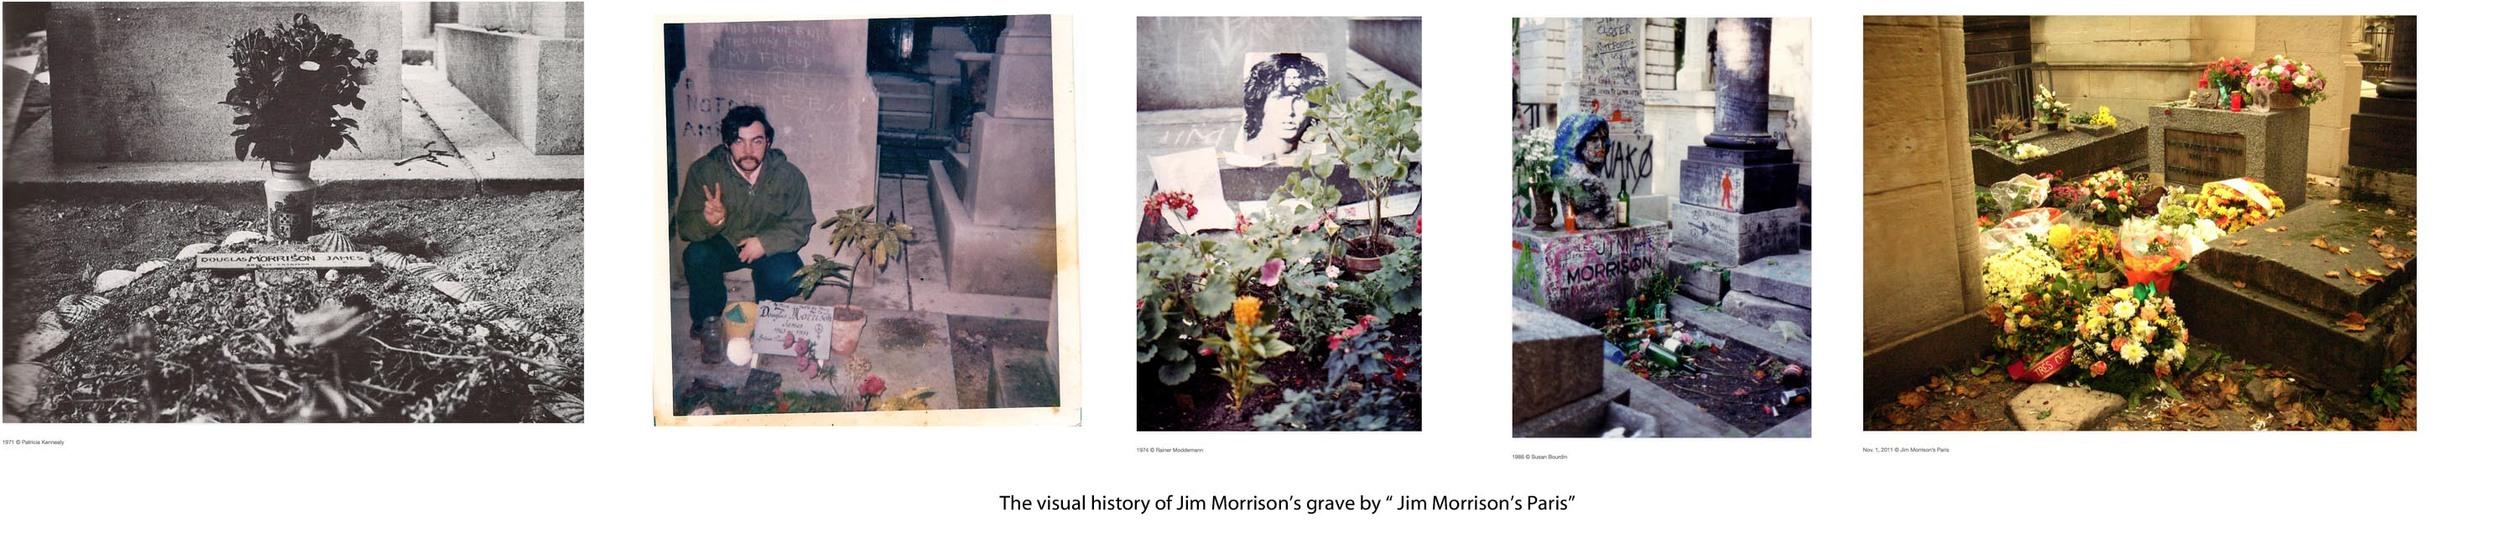 "© The visual history of Jim Morrison's grave / ""Jim Morrison's Paris"""